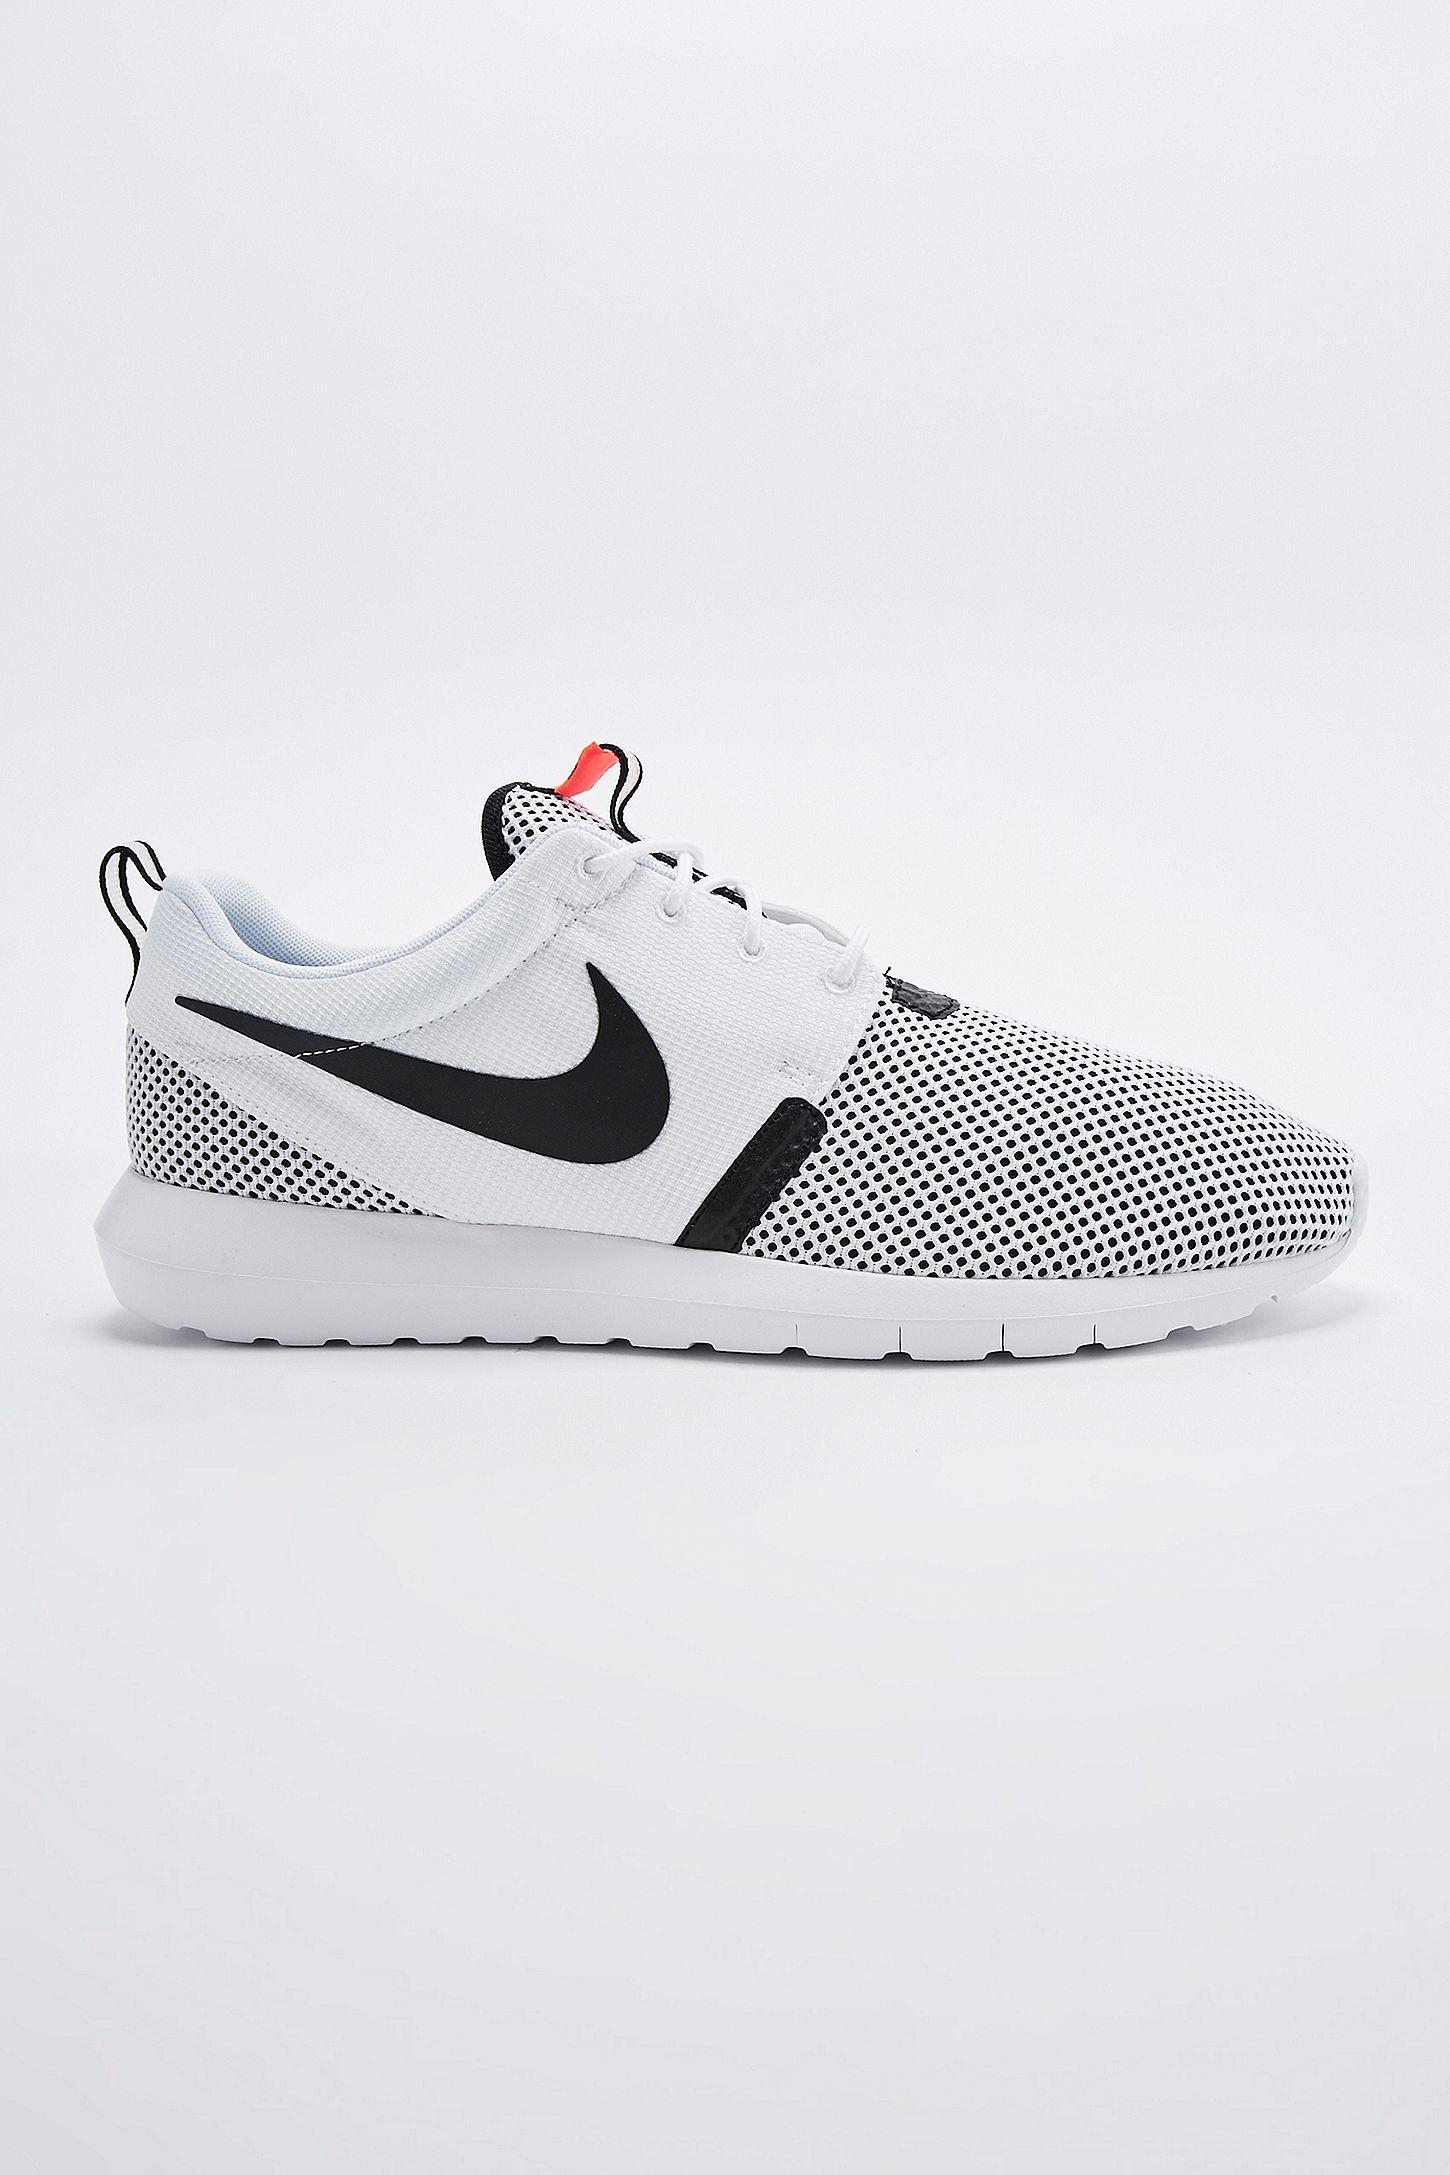 89757e04117cc Nike Roshe Run NM BR Trainers in White and Black